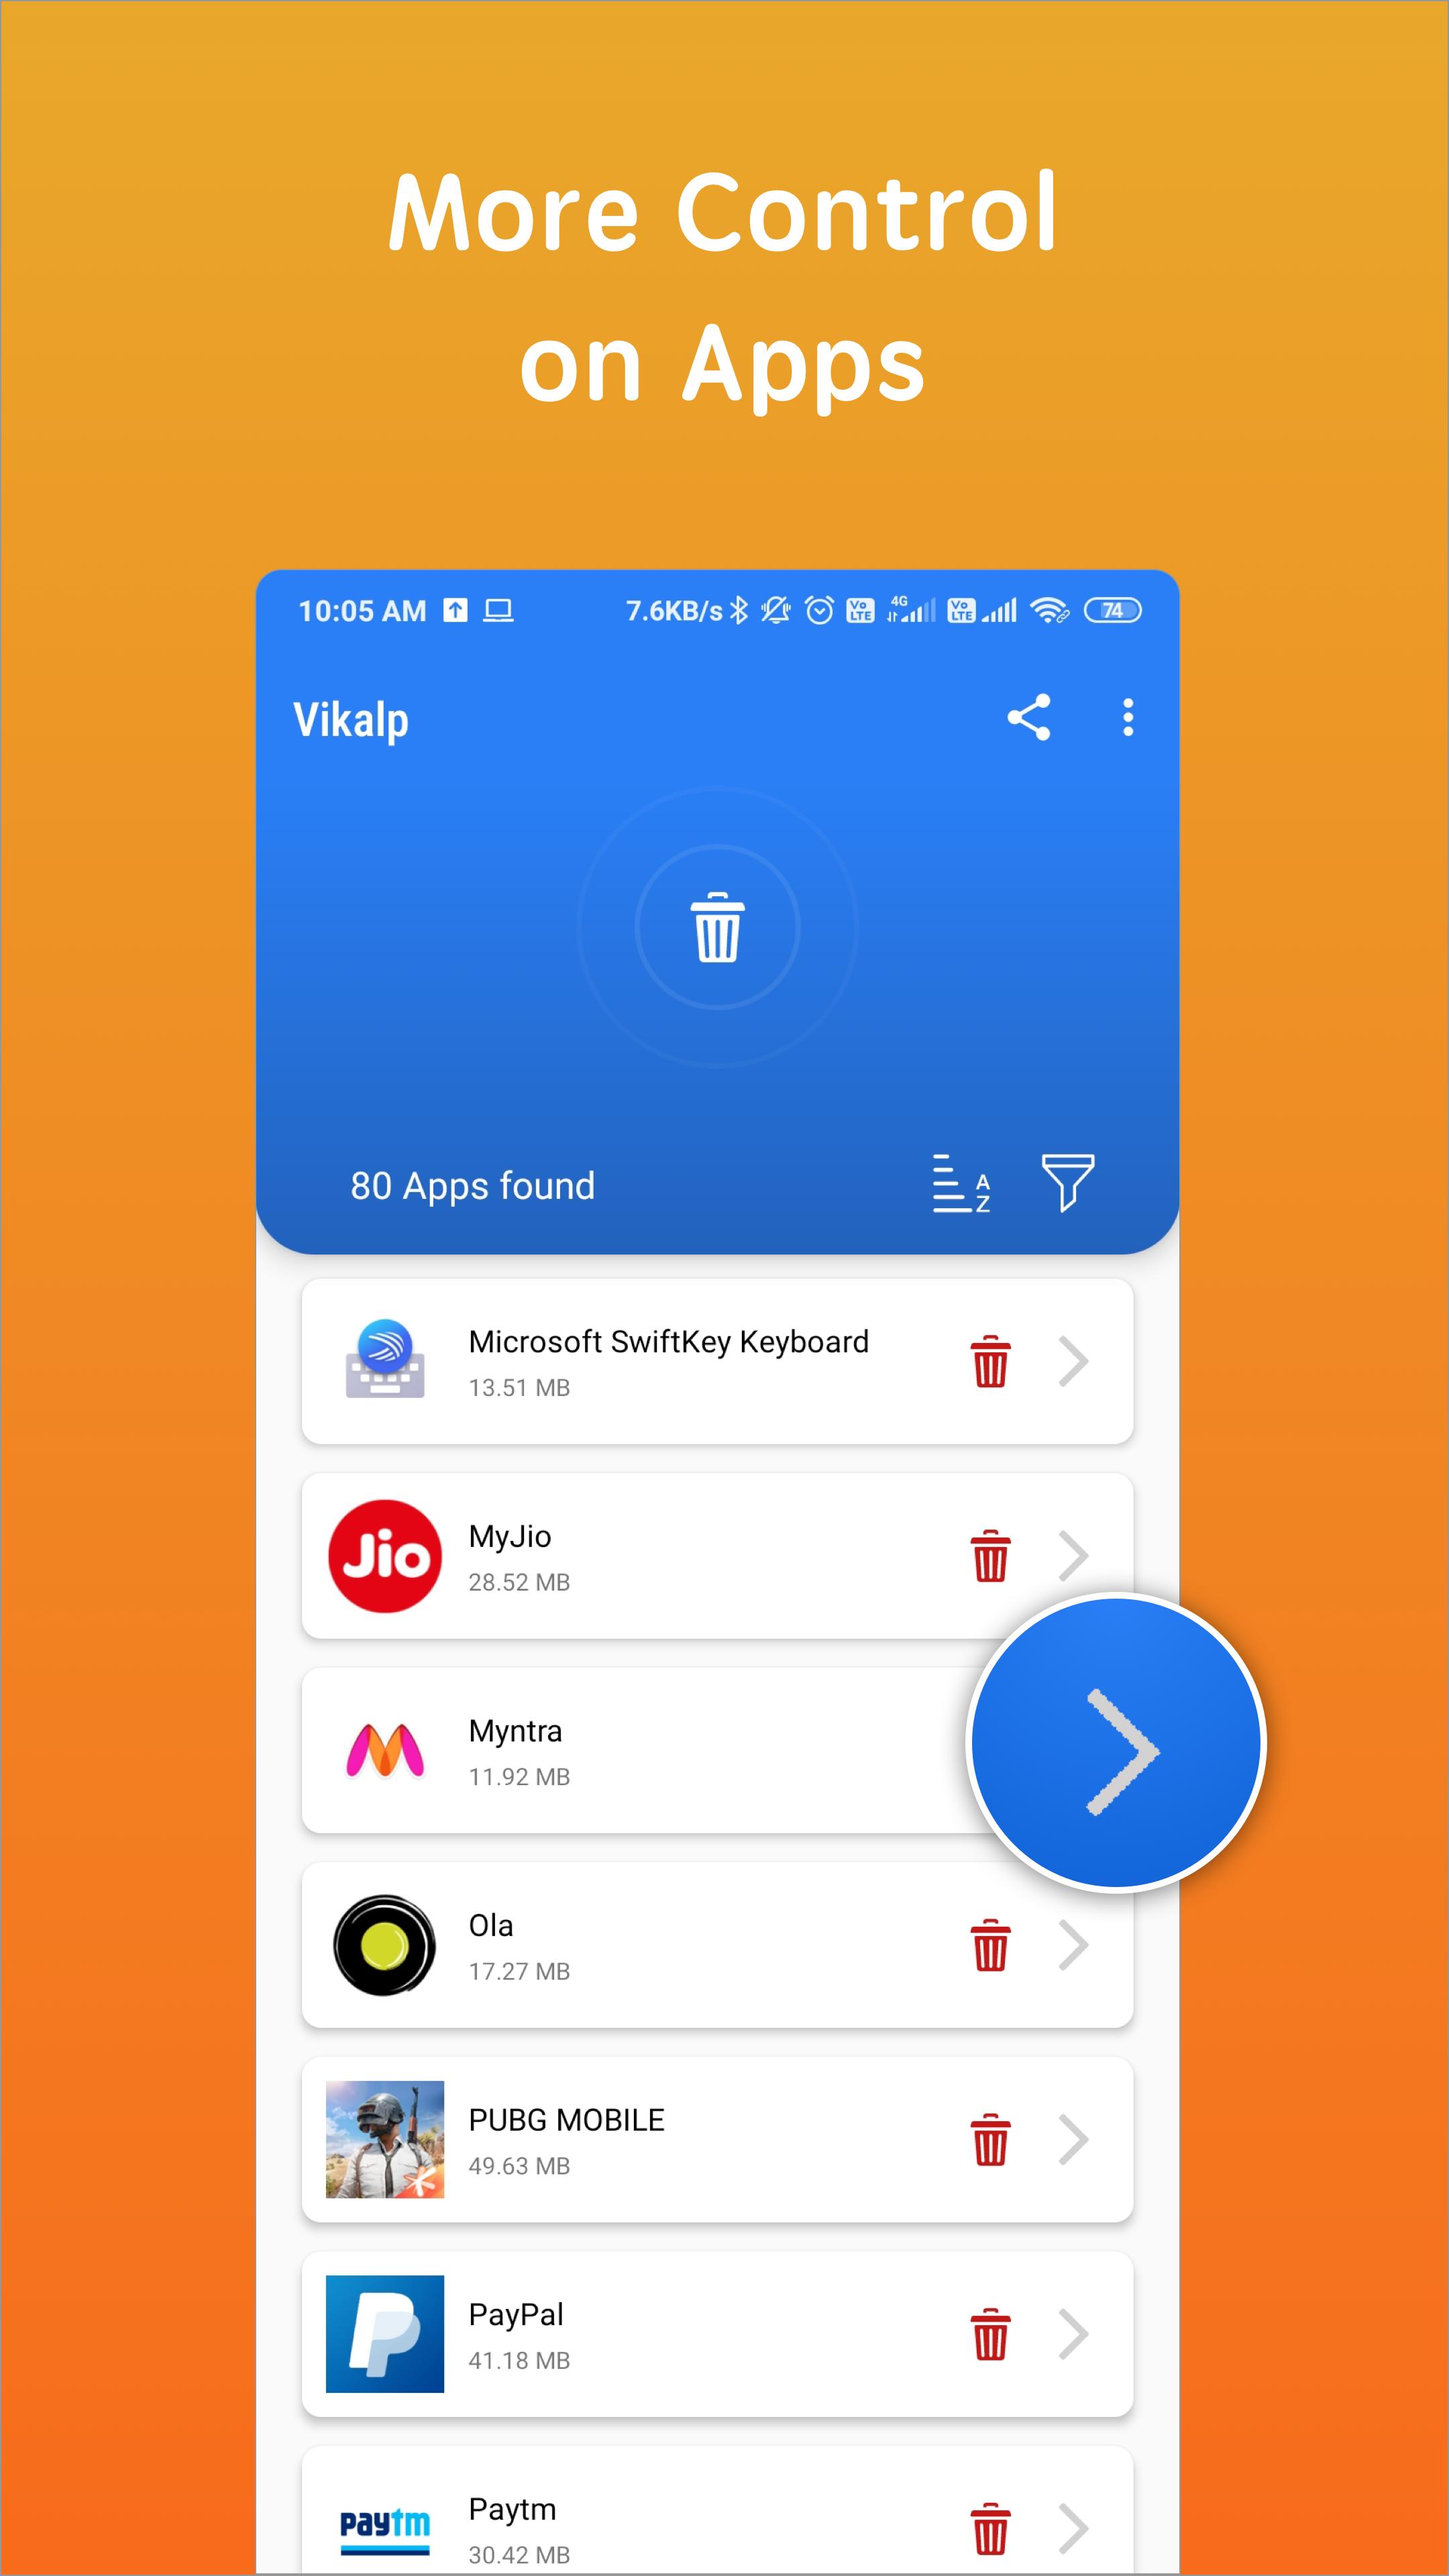 Vikalp - Remove Apps & Uninstall